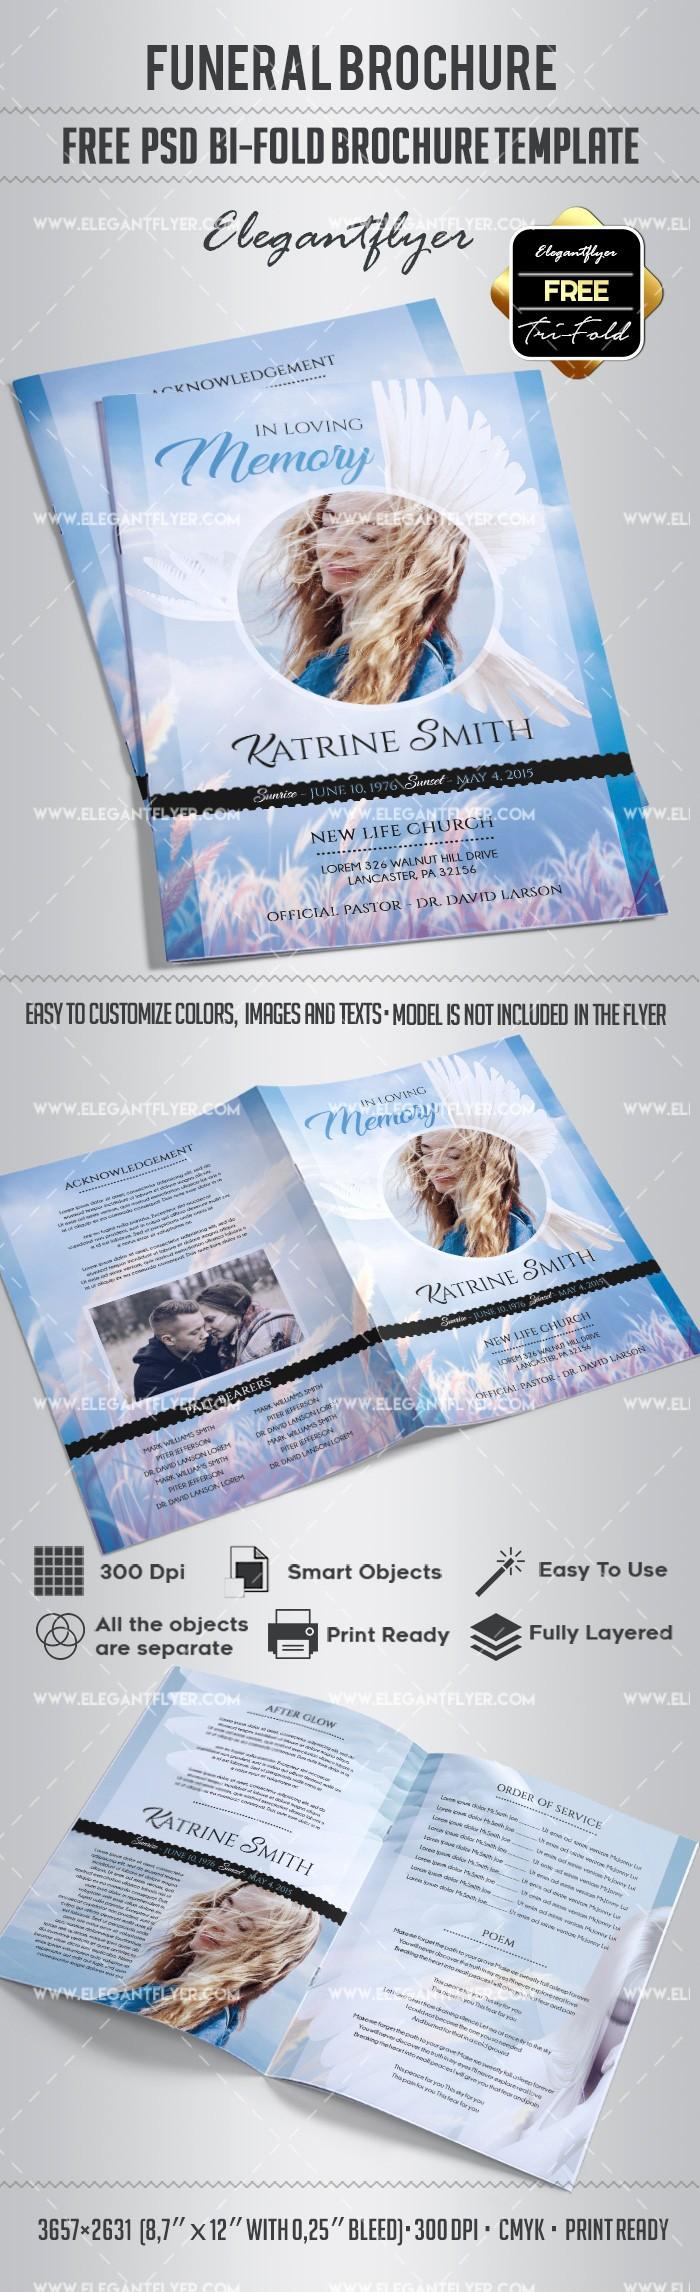 Bi-fold Card Template Unique Free Funeral Bi Fold Brochure – by Elegantflyer